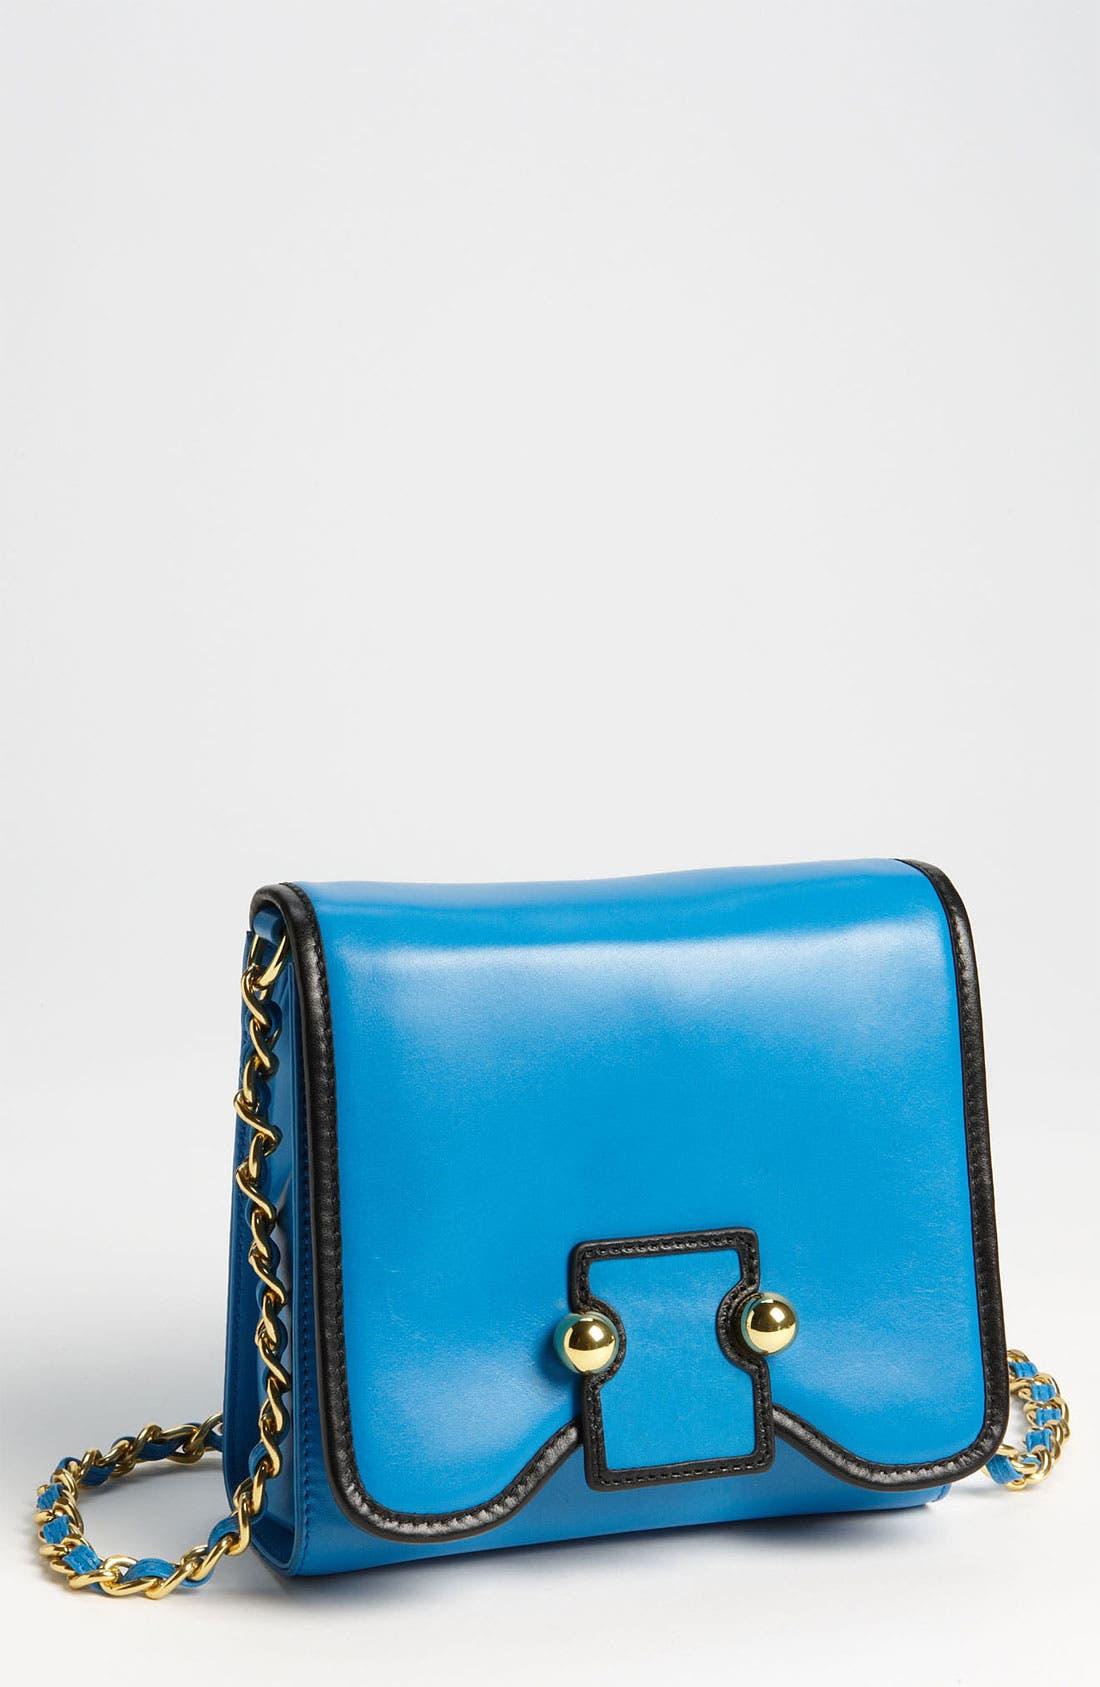 Main Image - Botkier 'Lucy' Crossbody Bag